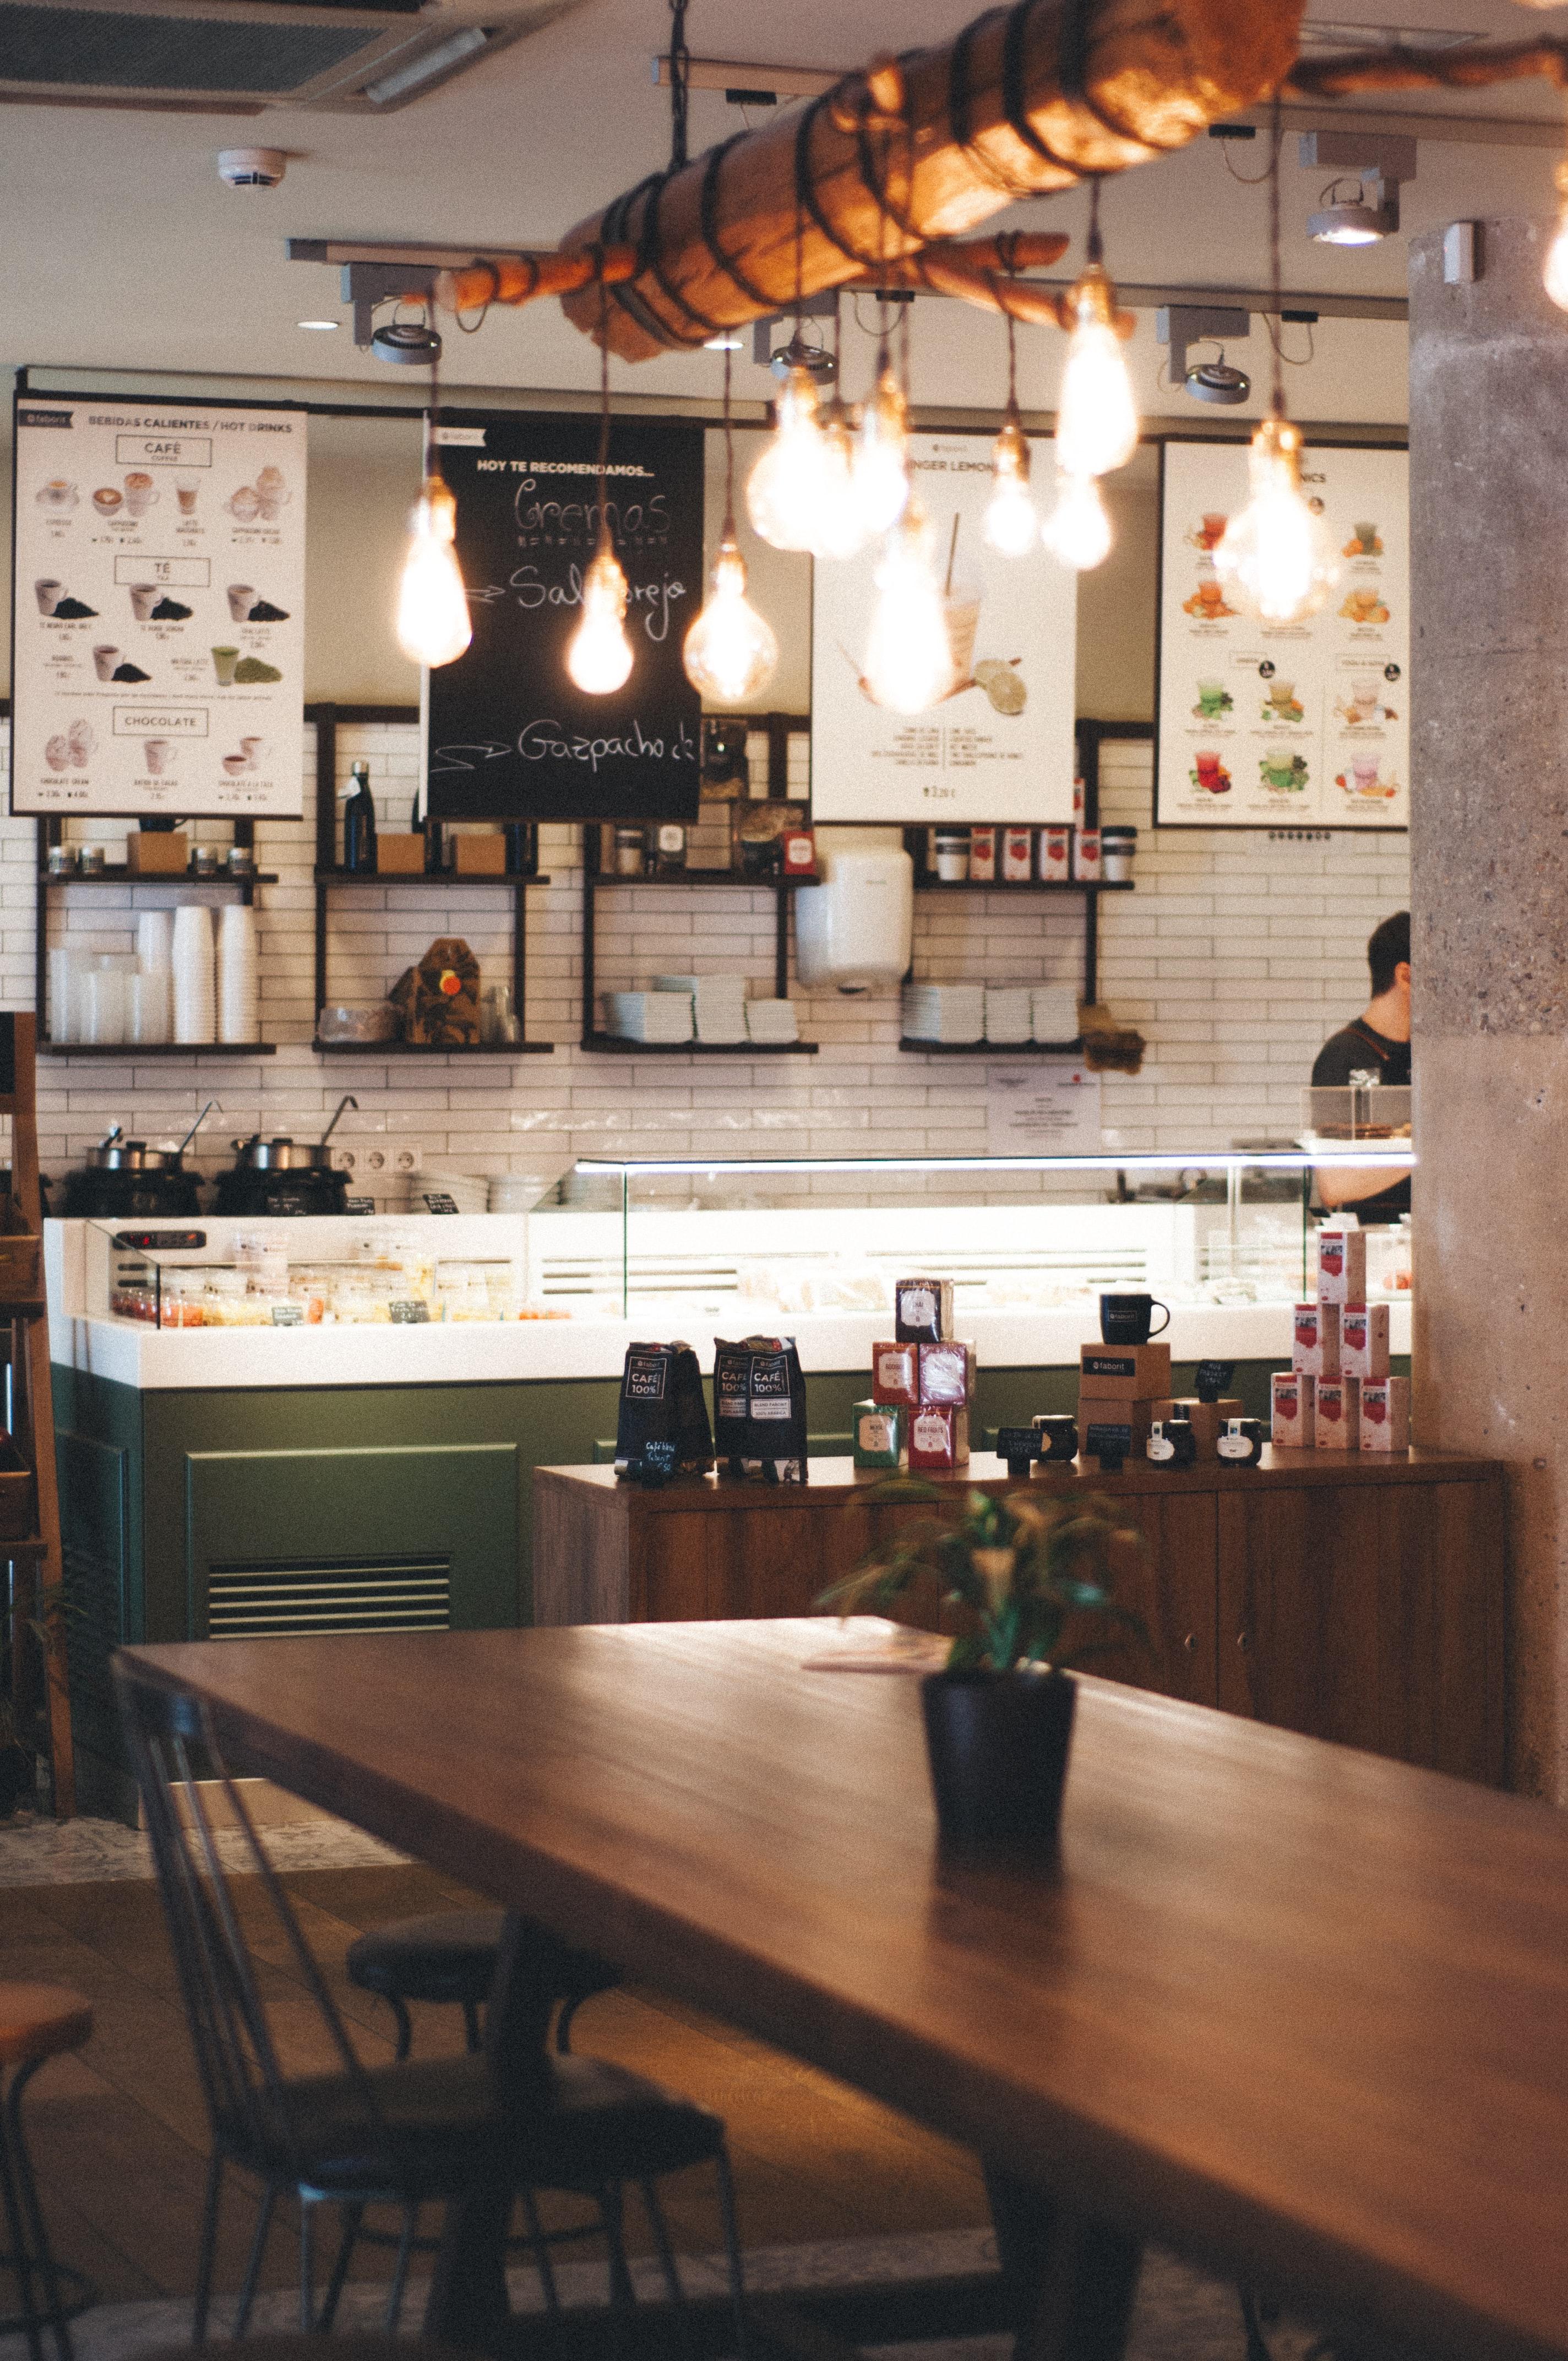 Free Restaurant Image On Unsplash